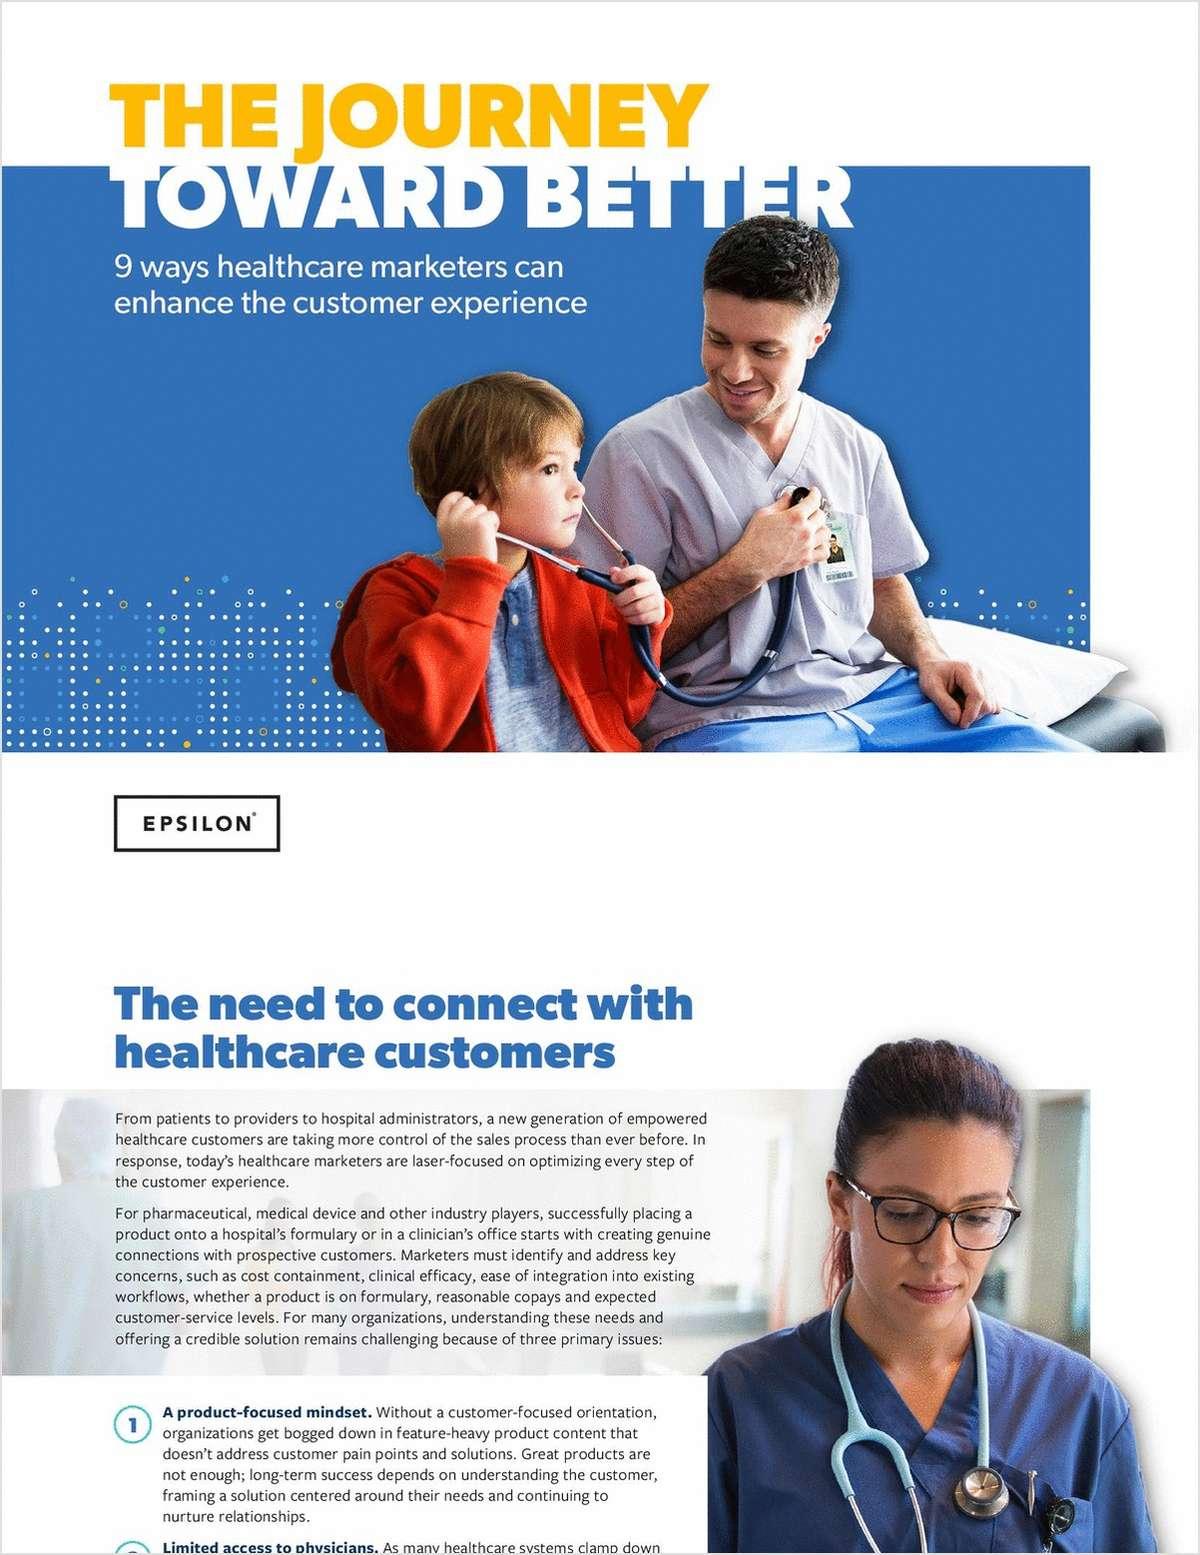 9 Ways to Enhance Healthcare Customer Experiences